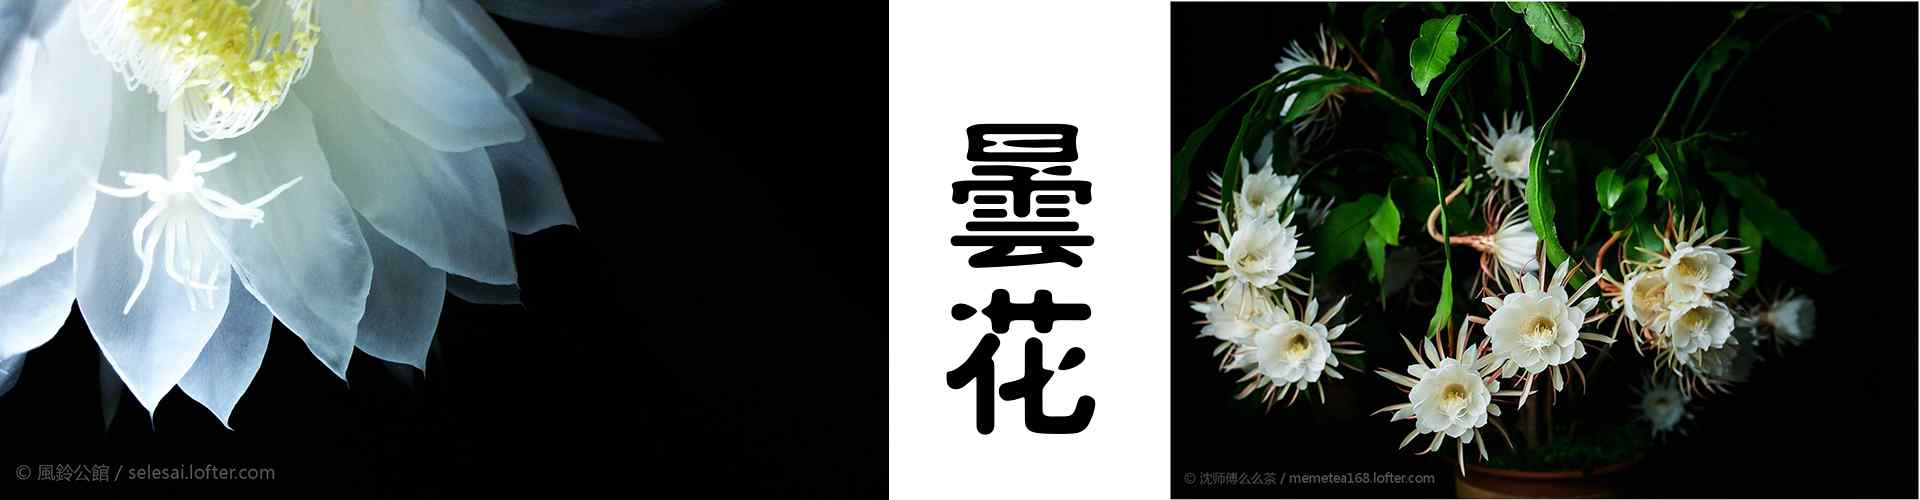 曇花(hua)_曇花(hua)圖片_曇花(hua)一現_鮮(xian)花(hua)圖片大全_植(zhi)物壁紙